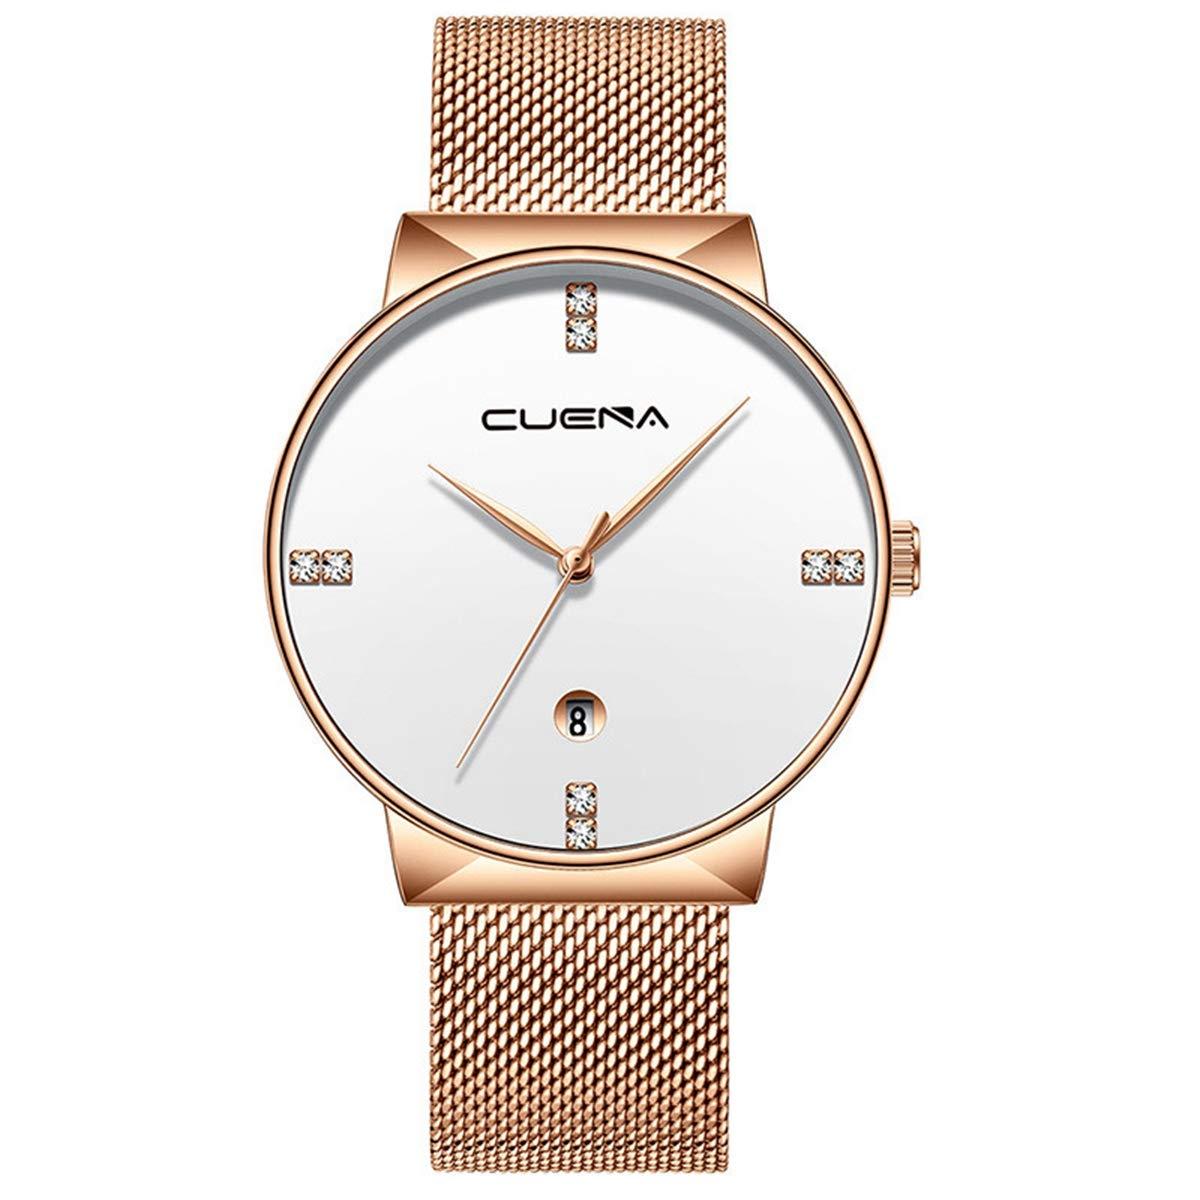 ZODRQ Men's Watch,Fashion Life Waterproof Sport Watches Stainless Steel Mesh Wrist Watch Wristwatch Date Quartz Watch Gift (C) by ZODRQ